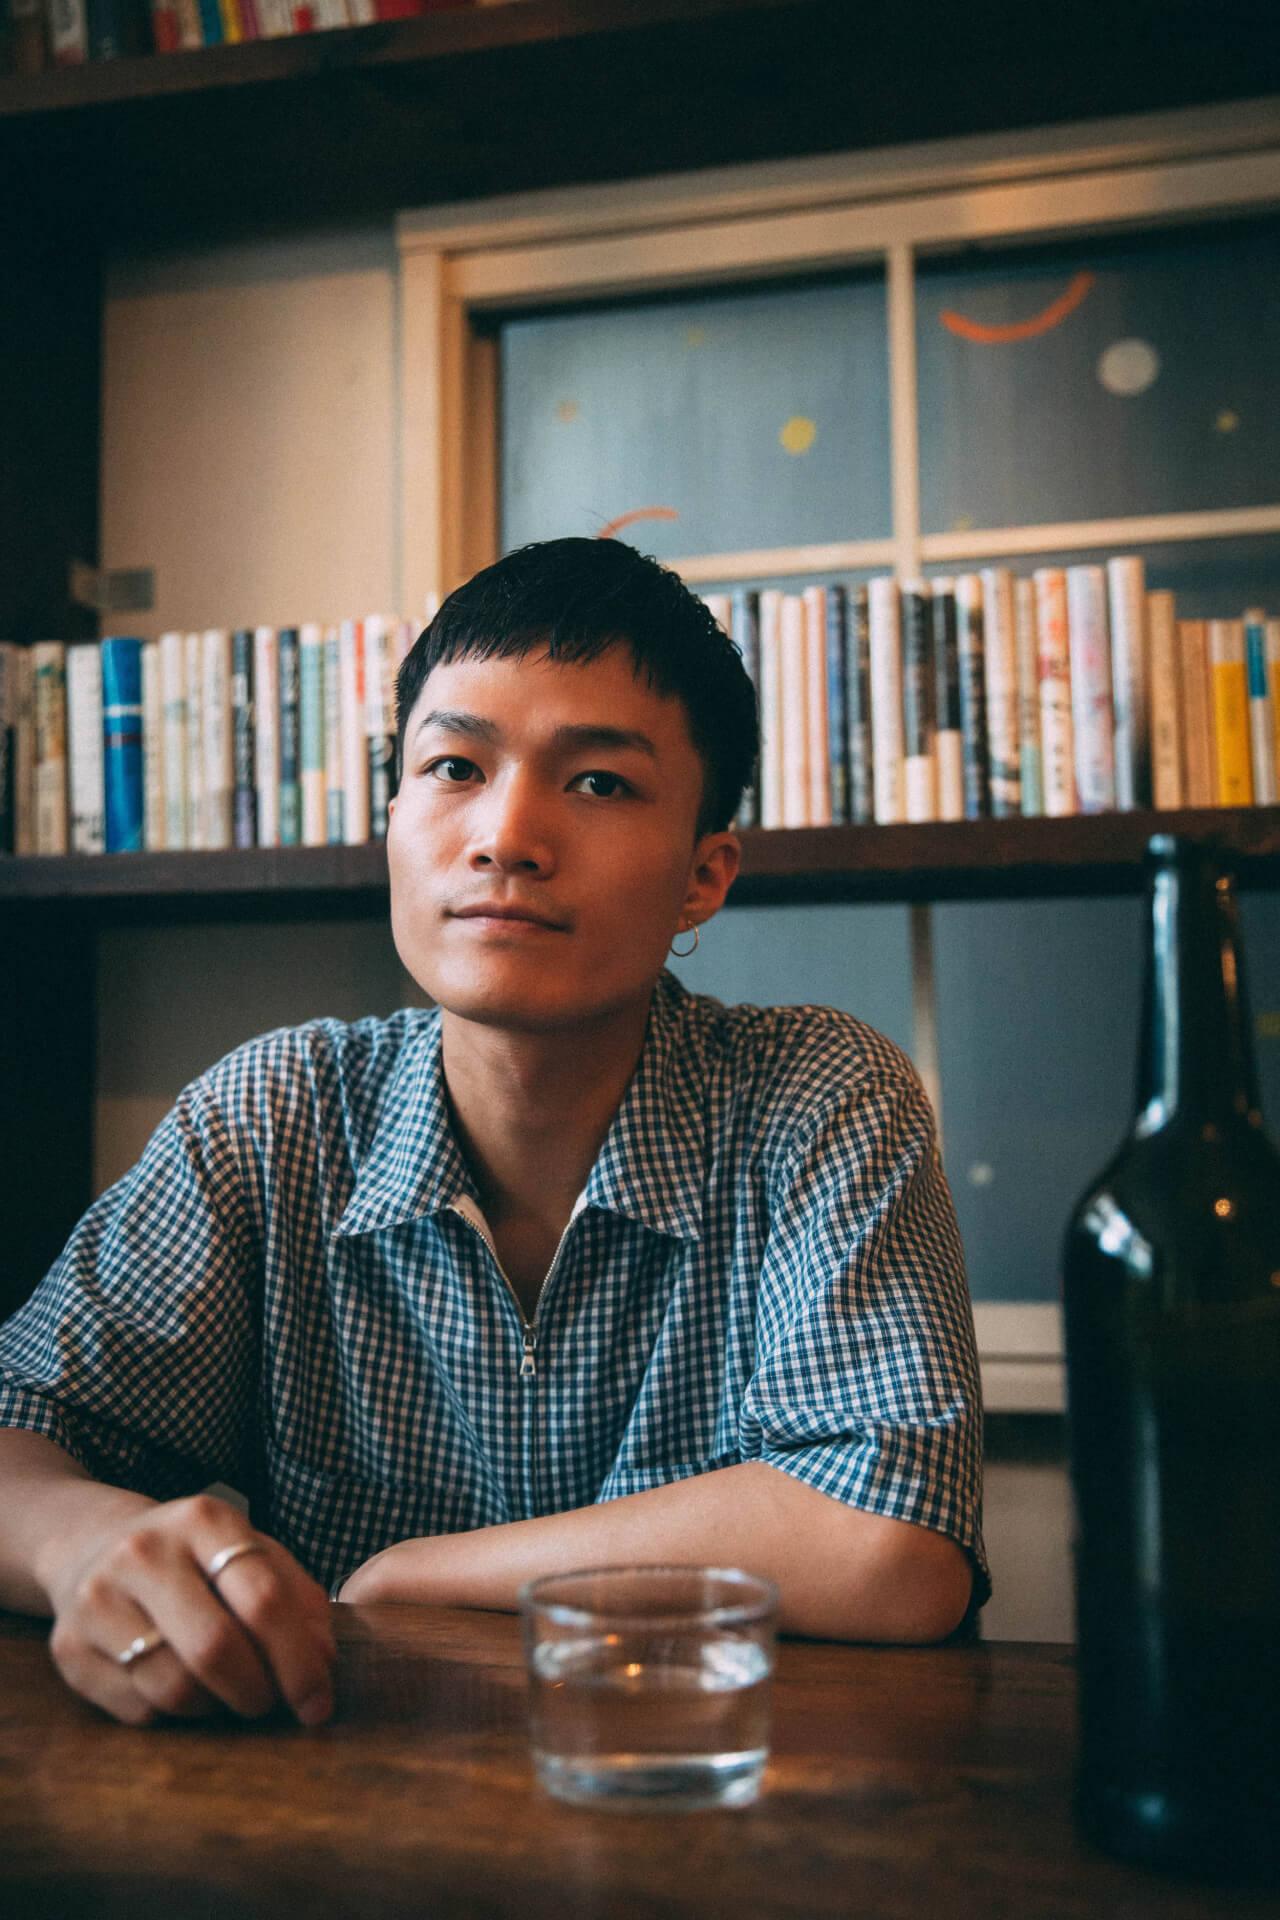 Shin Sakiuraが持つ無数の顔 — 初期衝動と現在地、ワンマンライブを語るインタビュー interview_190909_shinsakiura_756